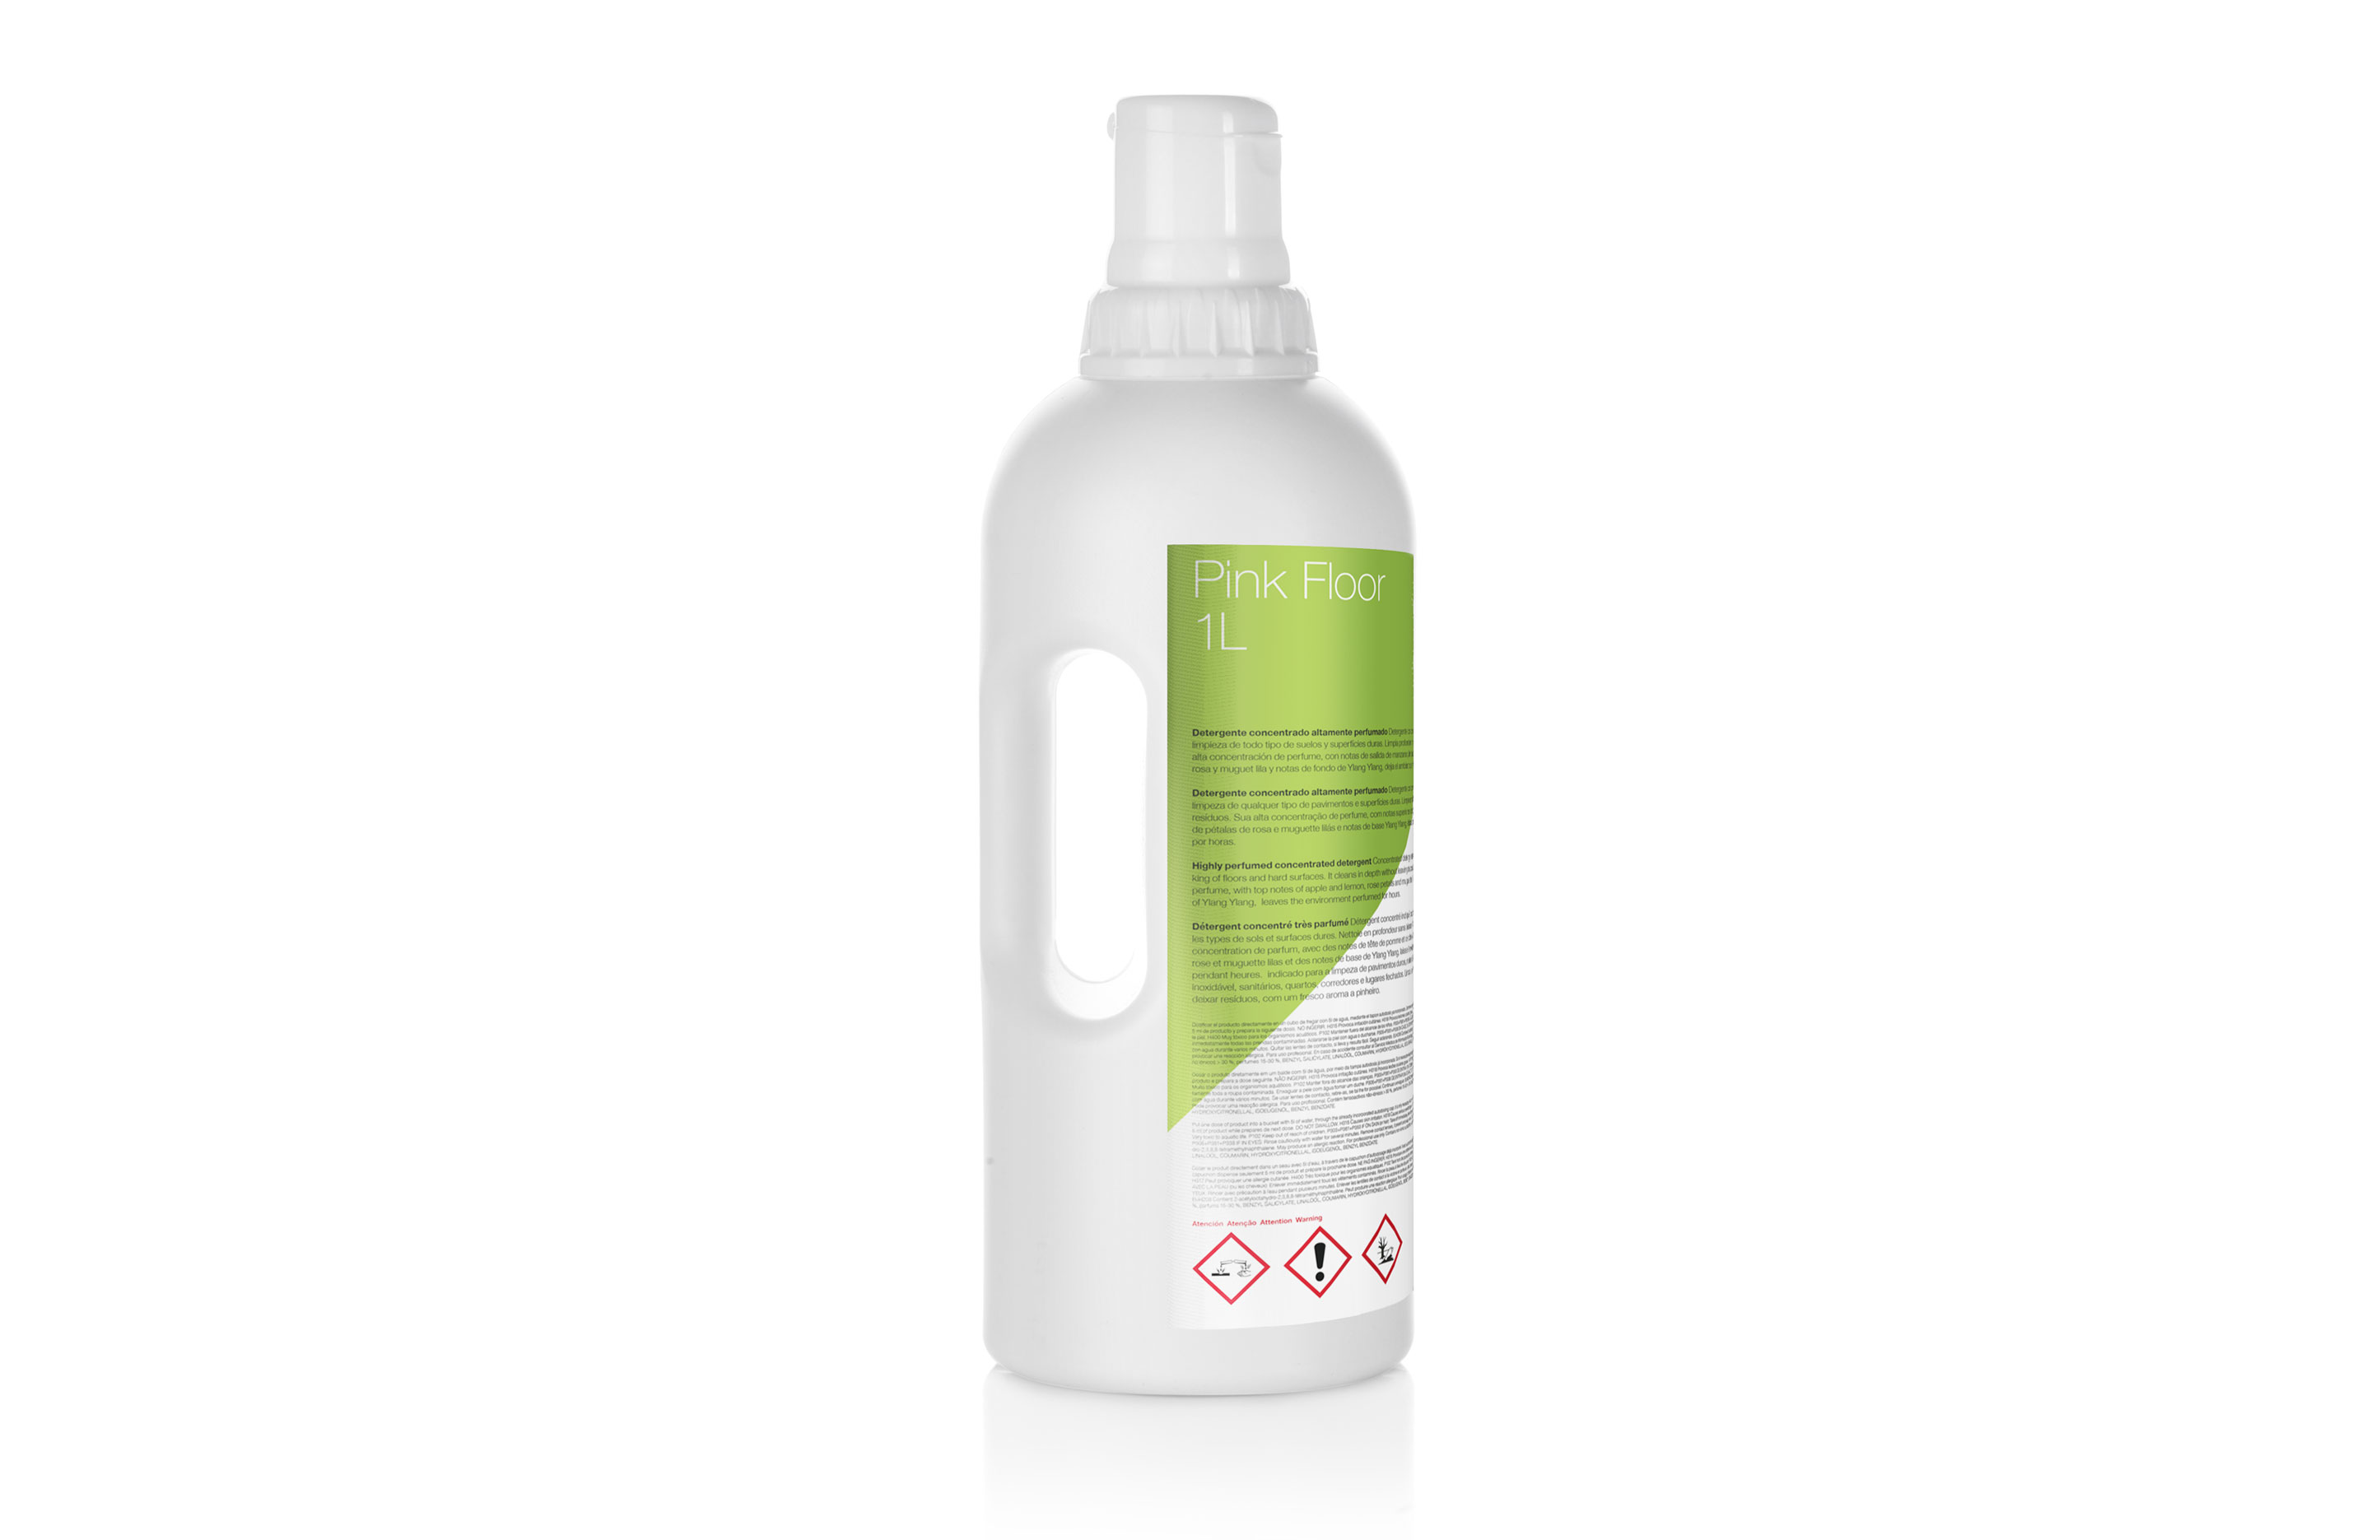 Pink Floor, Detergent concentrat altament perfumat